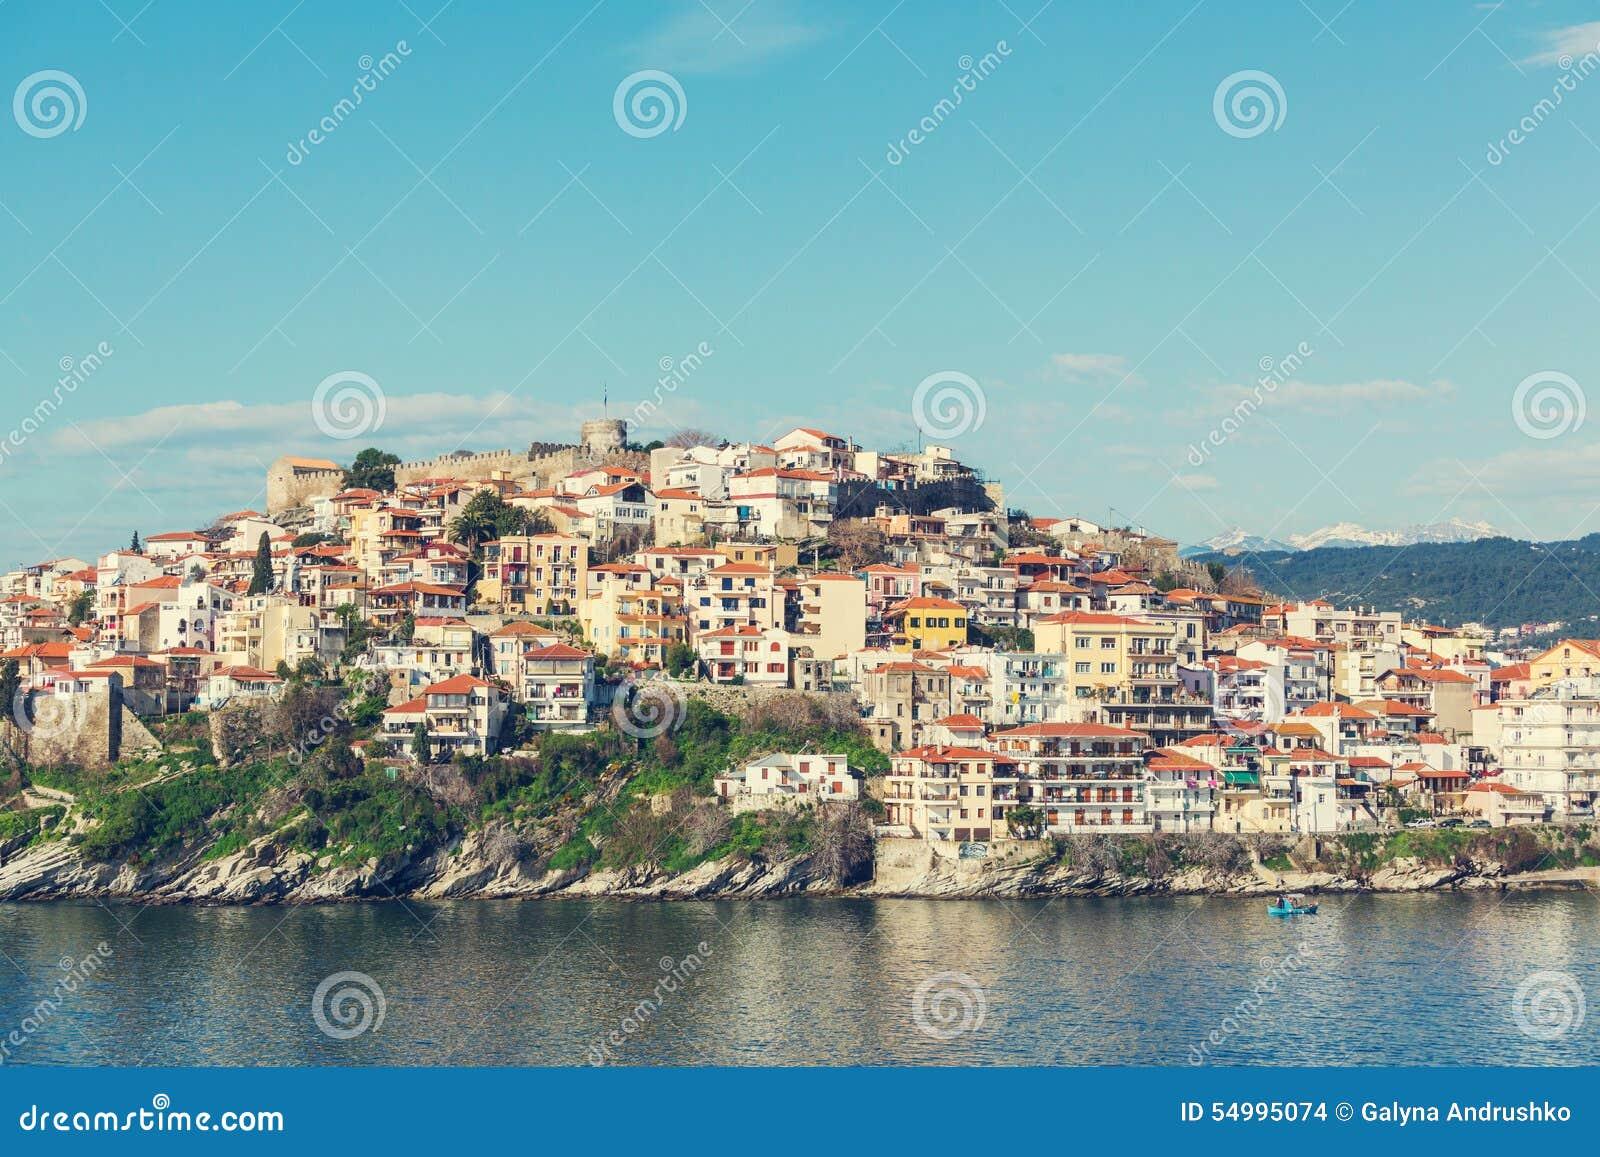 Grekland stad